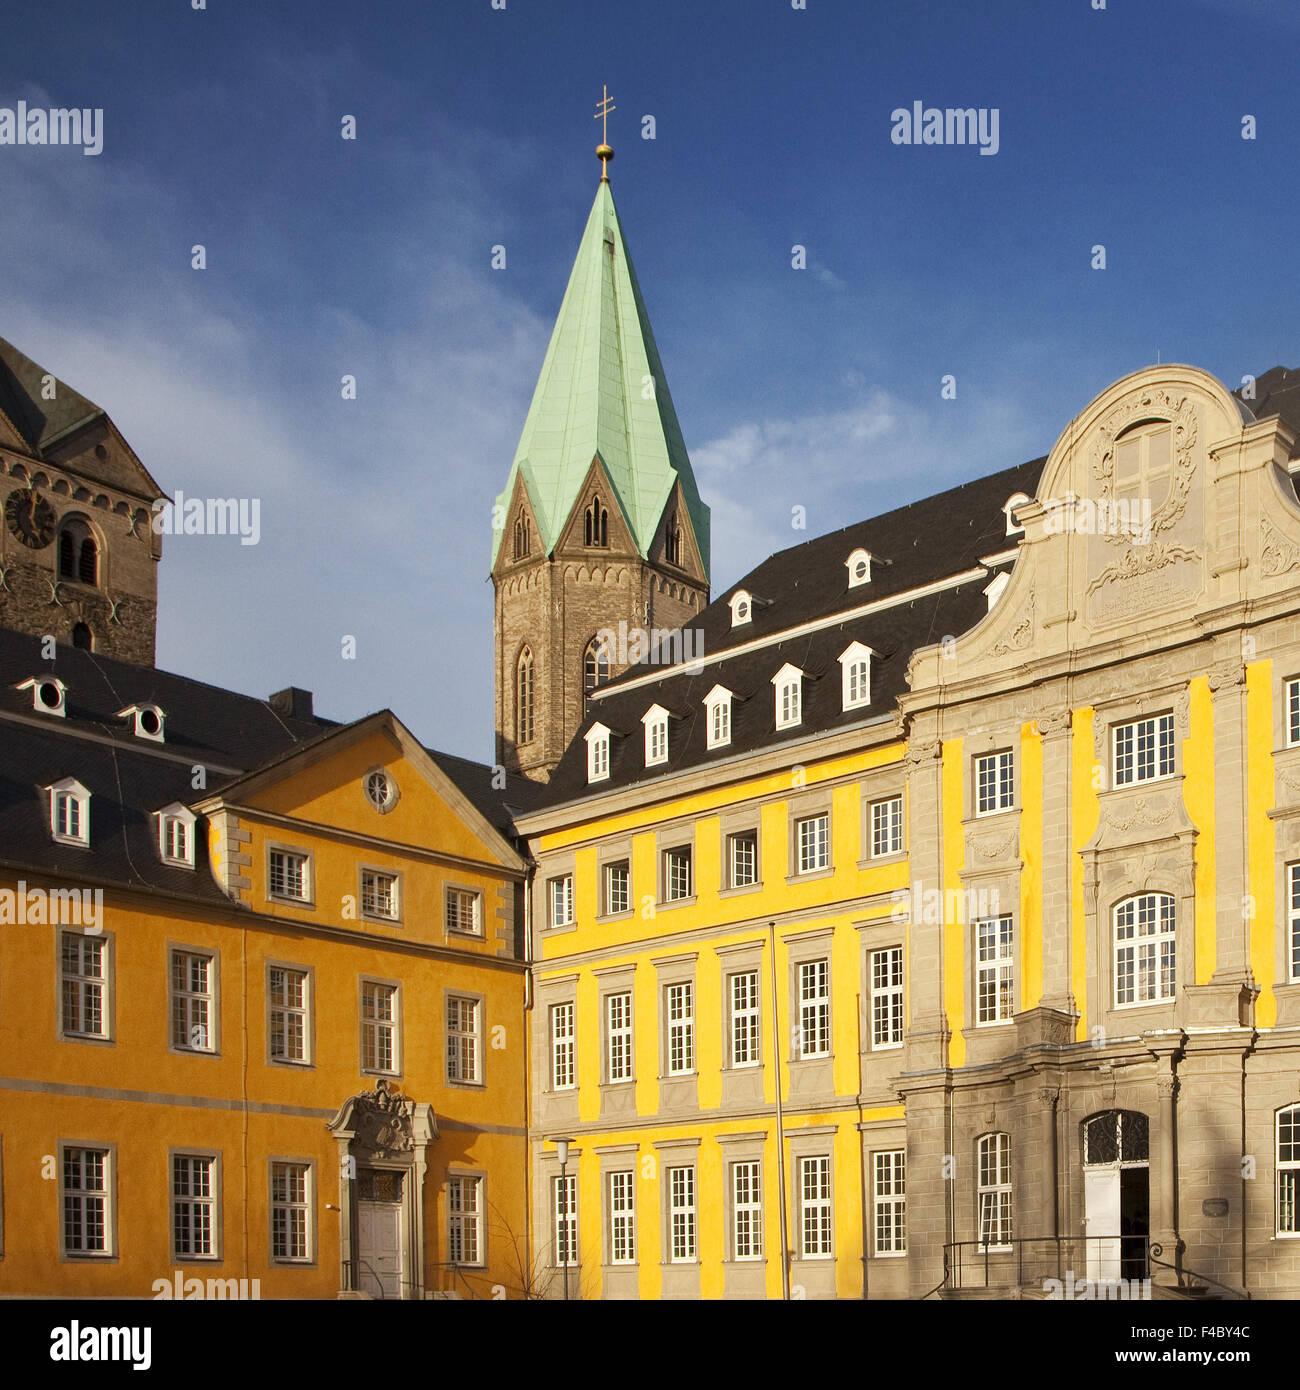 Folkwang University, Essen, Germany - Stock Image